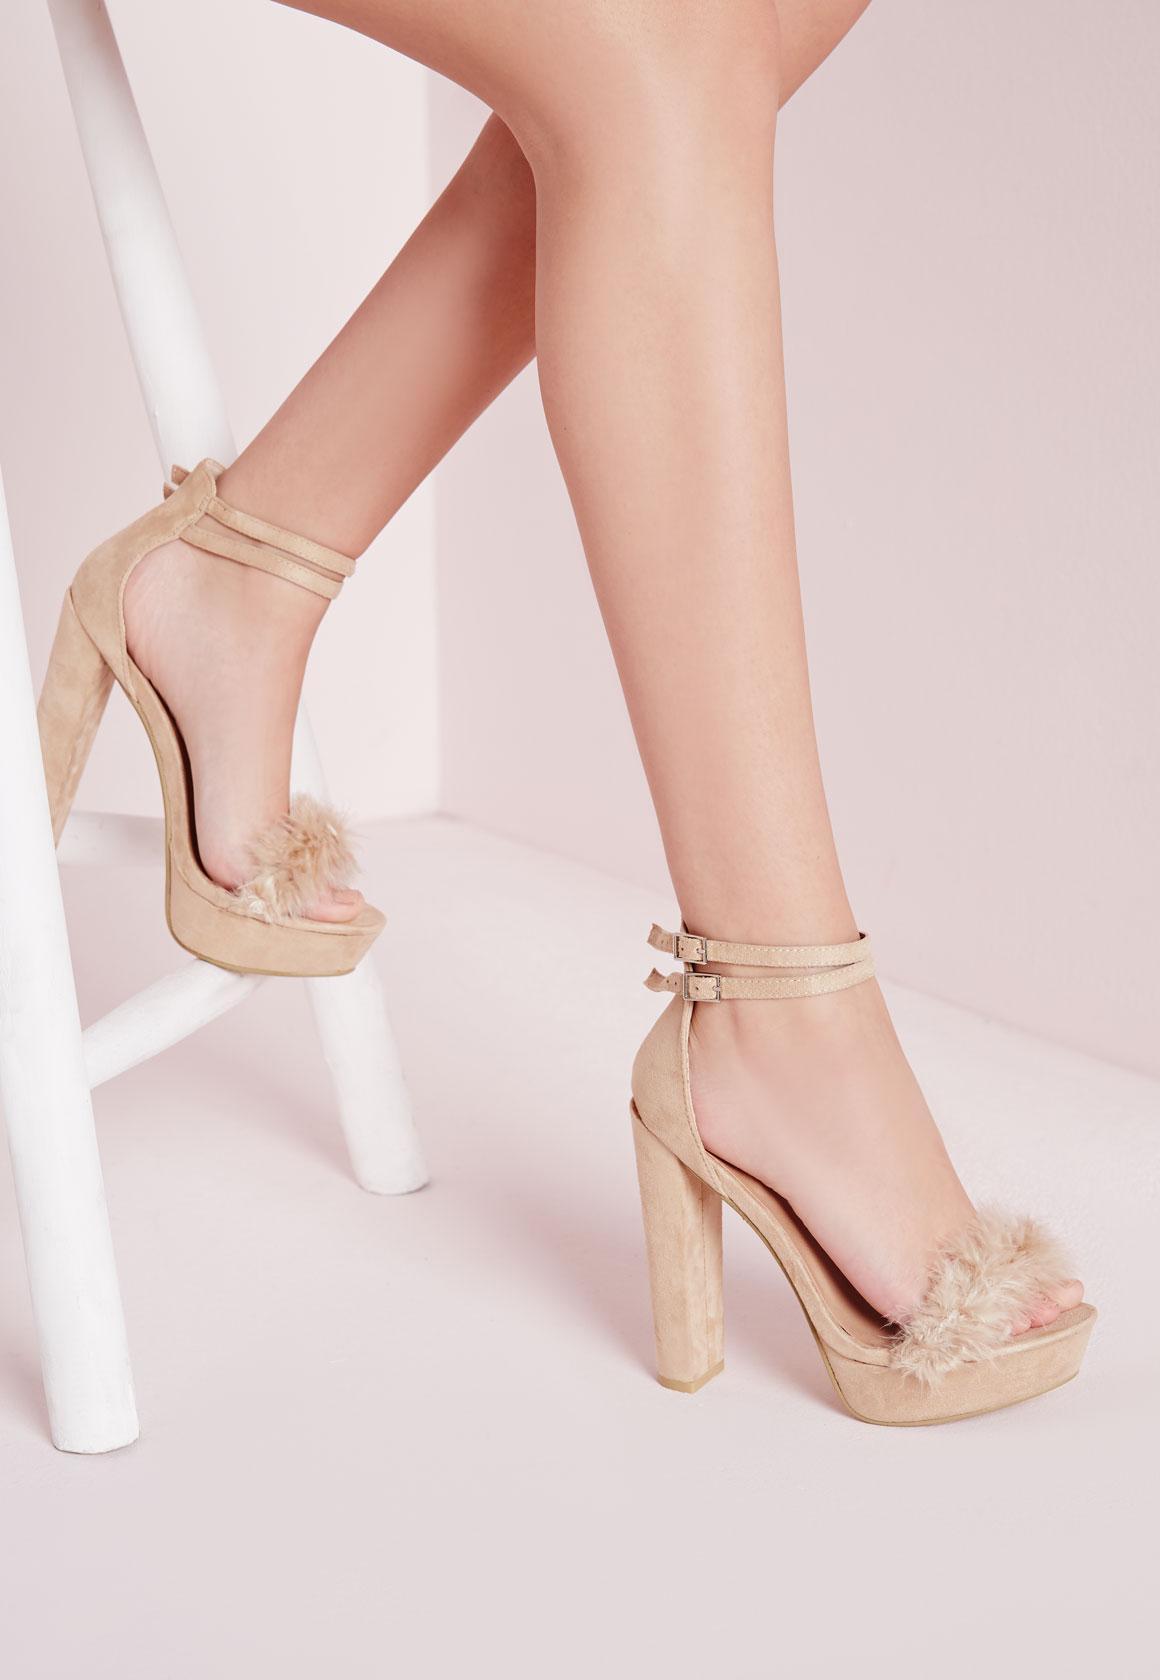 Fur Trim 70's Platform Sandals Cream - Shoes - High Heels - Missguided